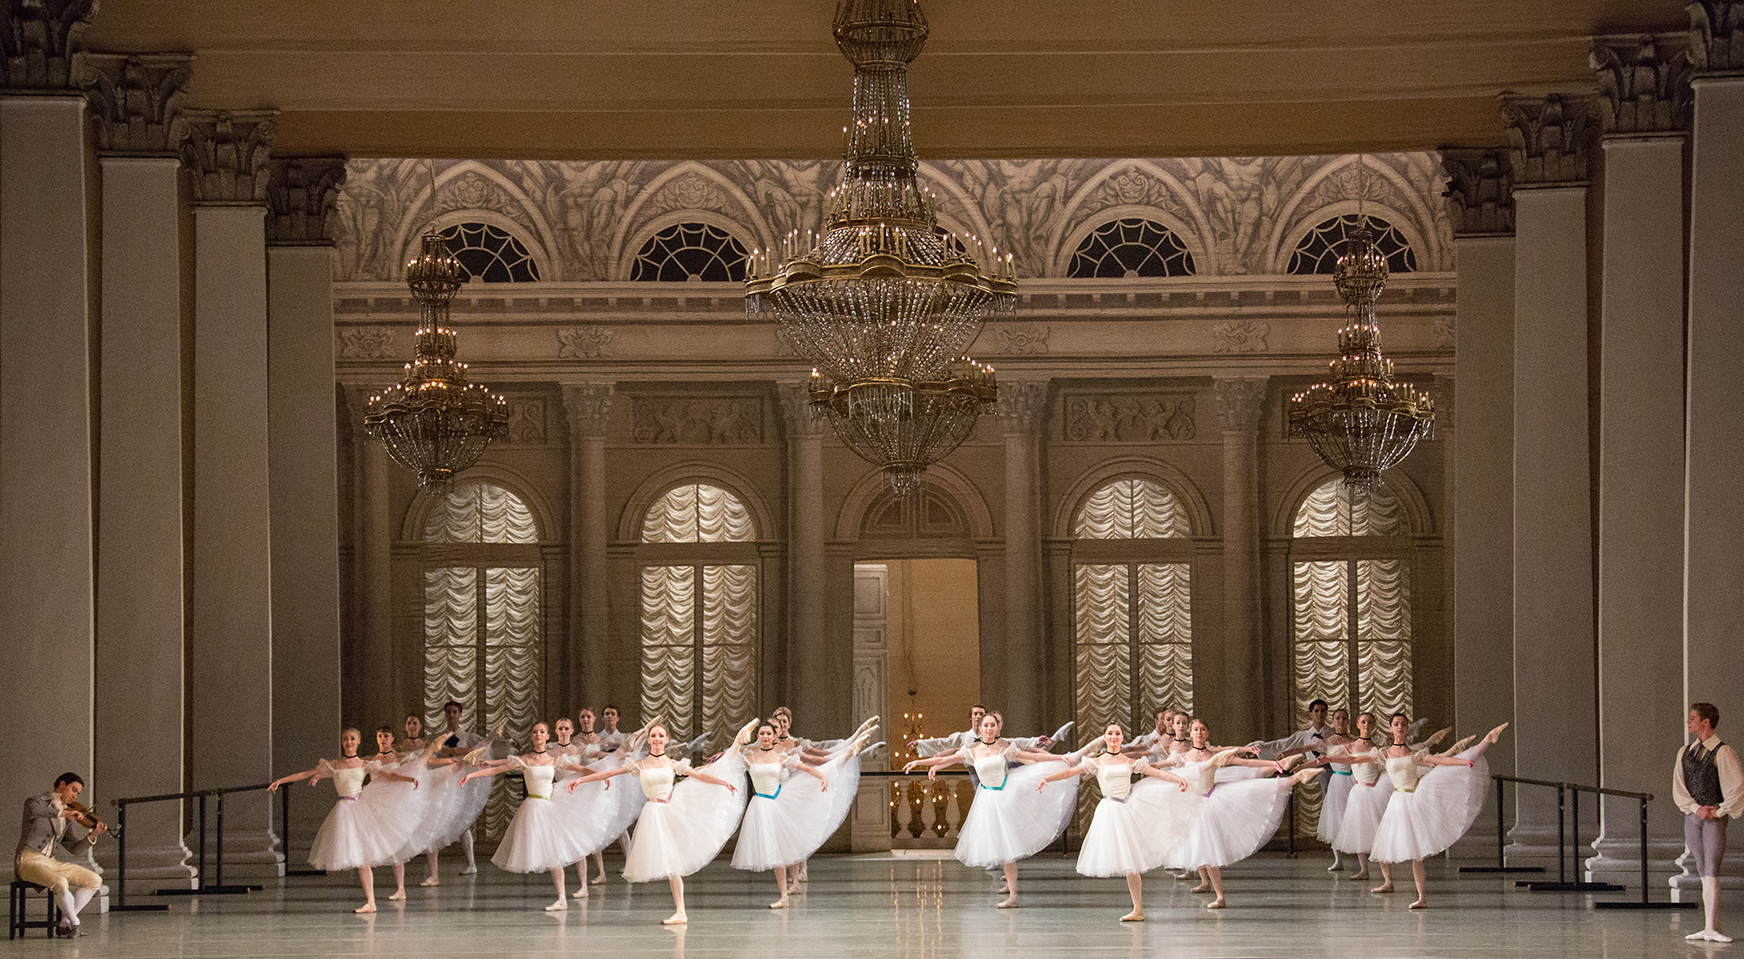 Academia de ballet en latex - 1 part 3